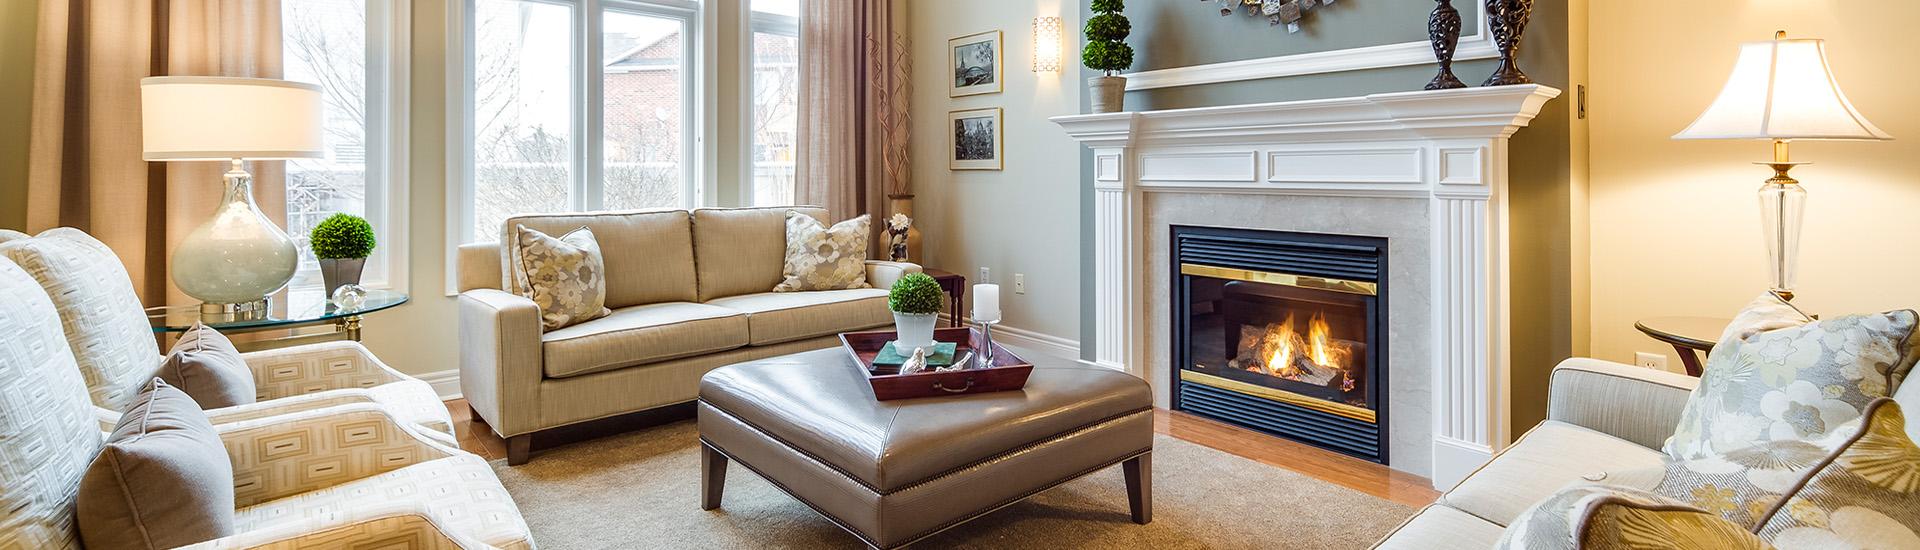 excellent living room interior design | Home & Office Interior Design Services :: Design Excellence